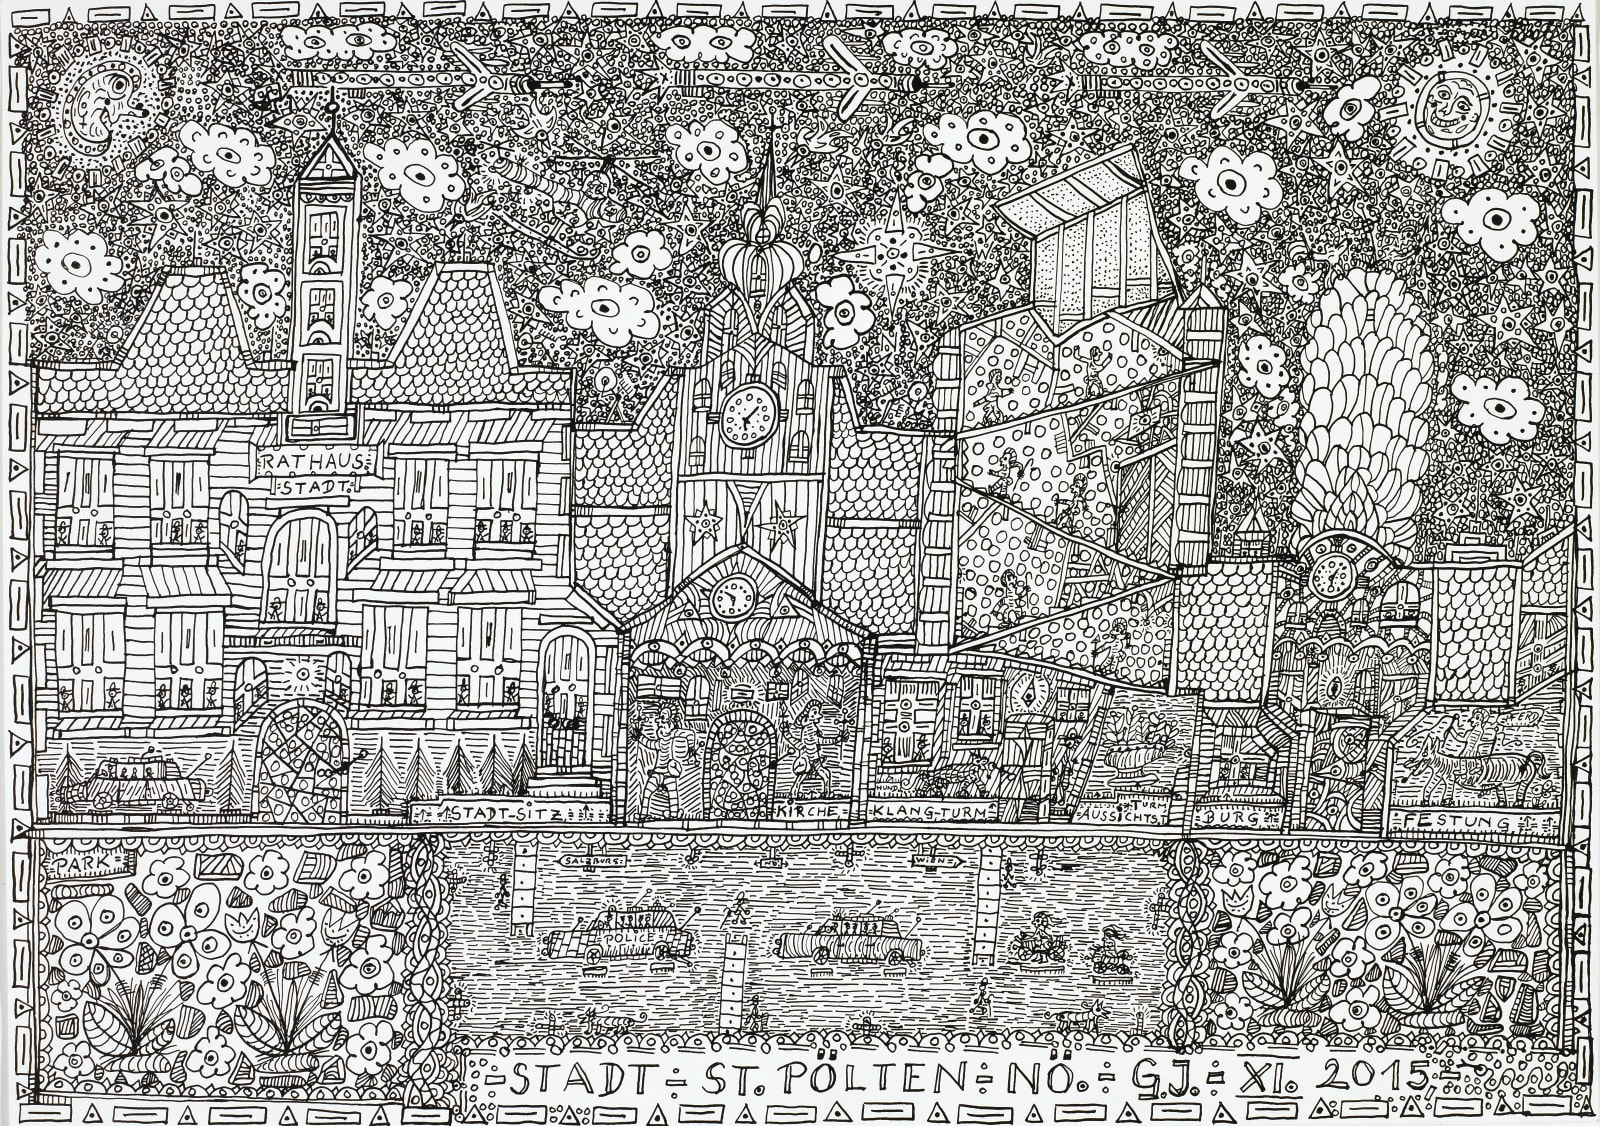 City-St. Pölten, 2015 India ink on paper 11 5/8 x 16 3/8 in. (29.6 x 41.7 cm.) (JGG 15) SOLD